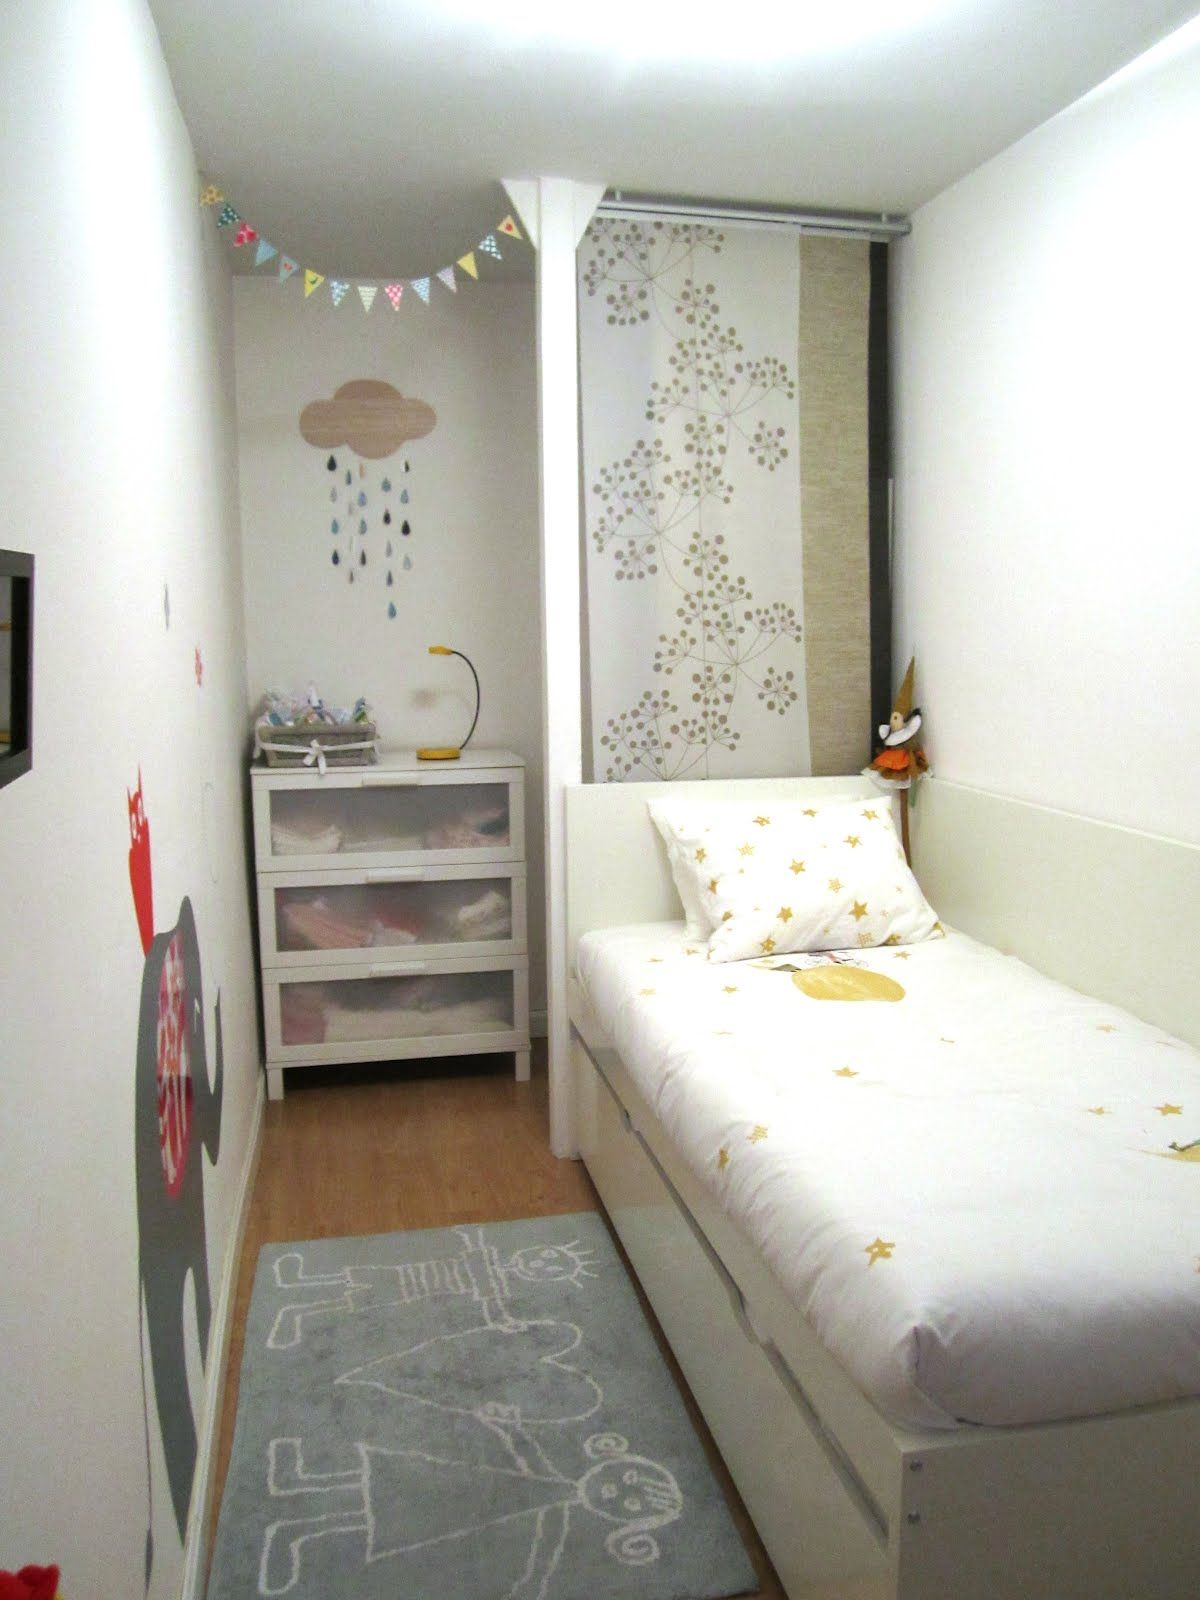 Elle Blogs | Very small bedroom, Small room bedroom, Tiny ...